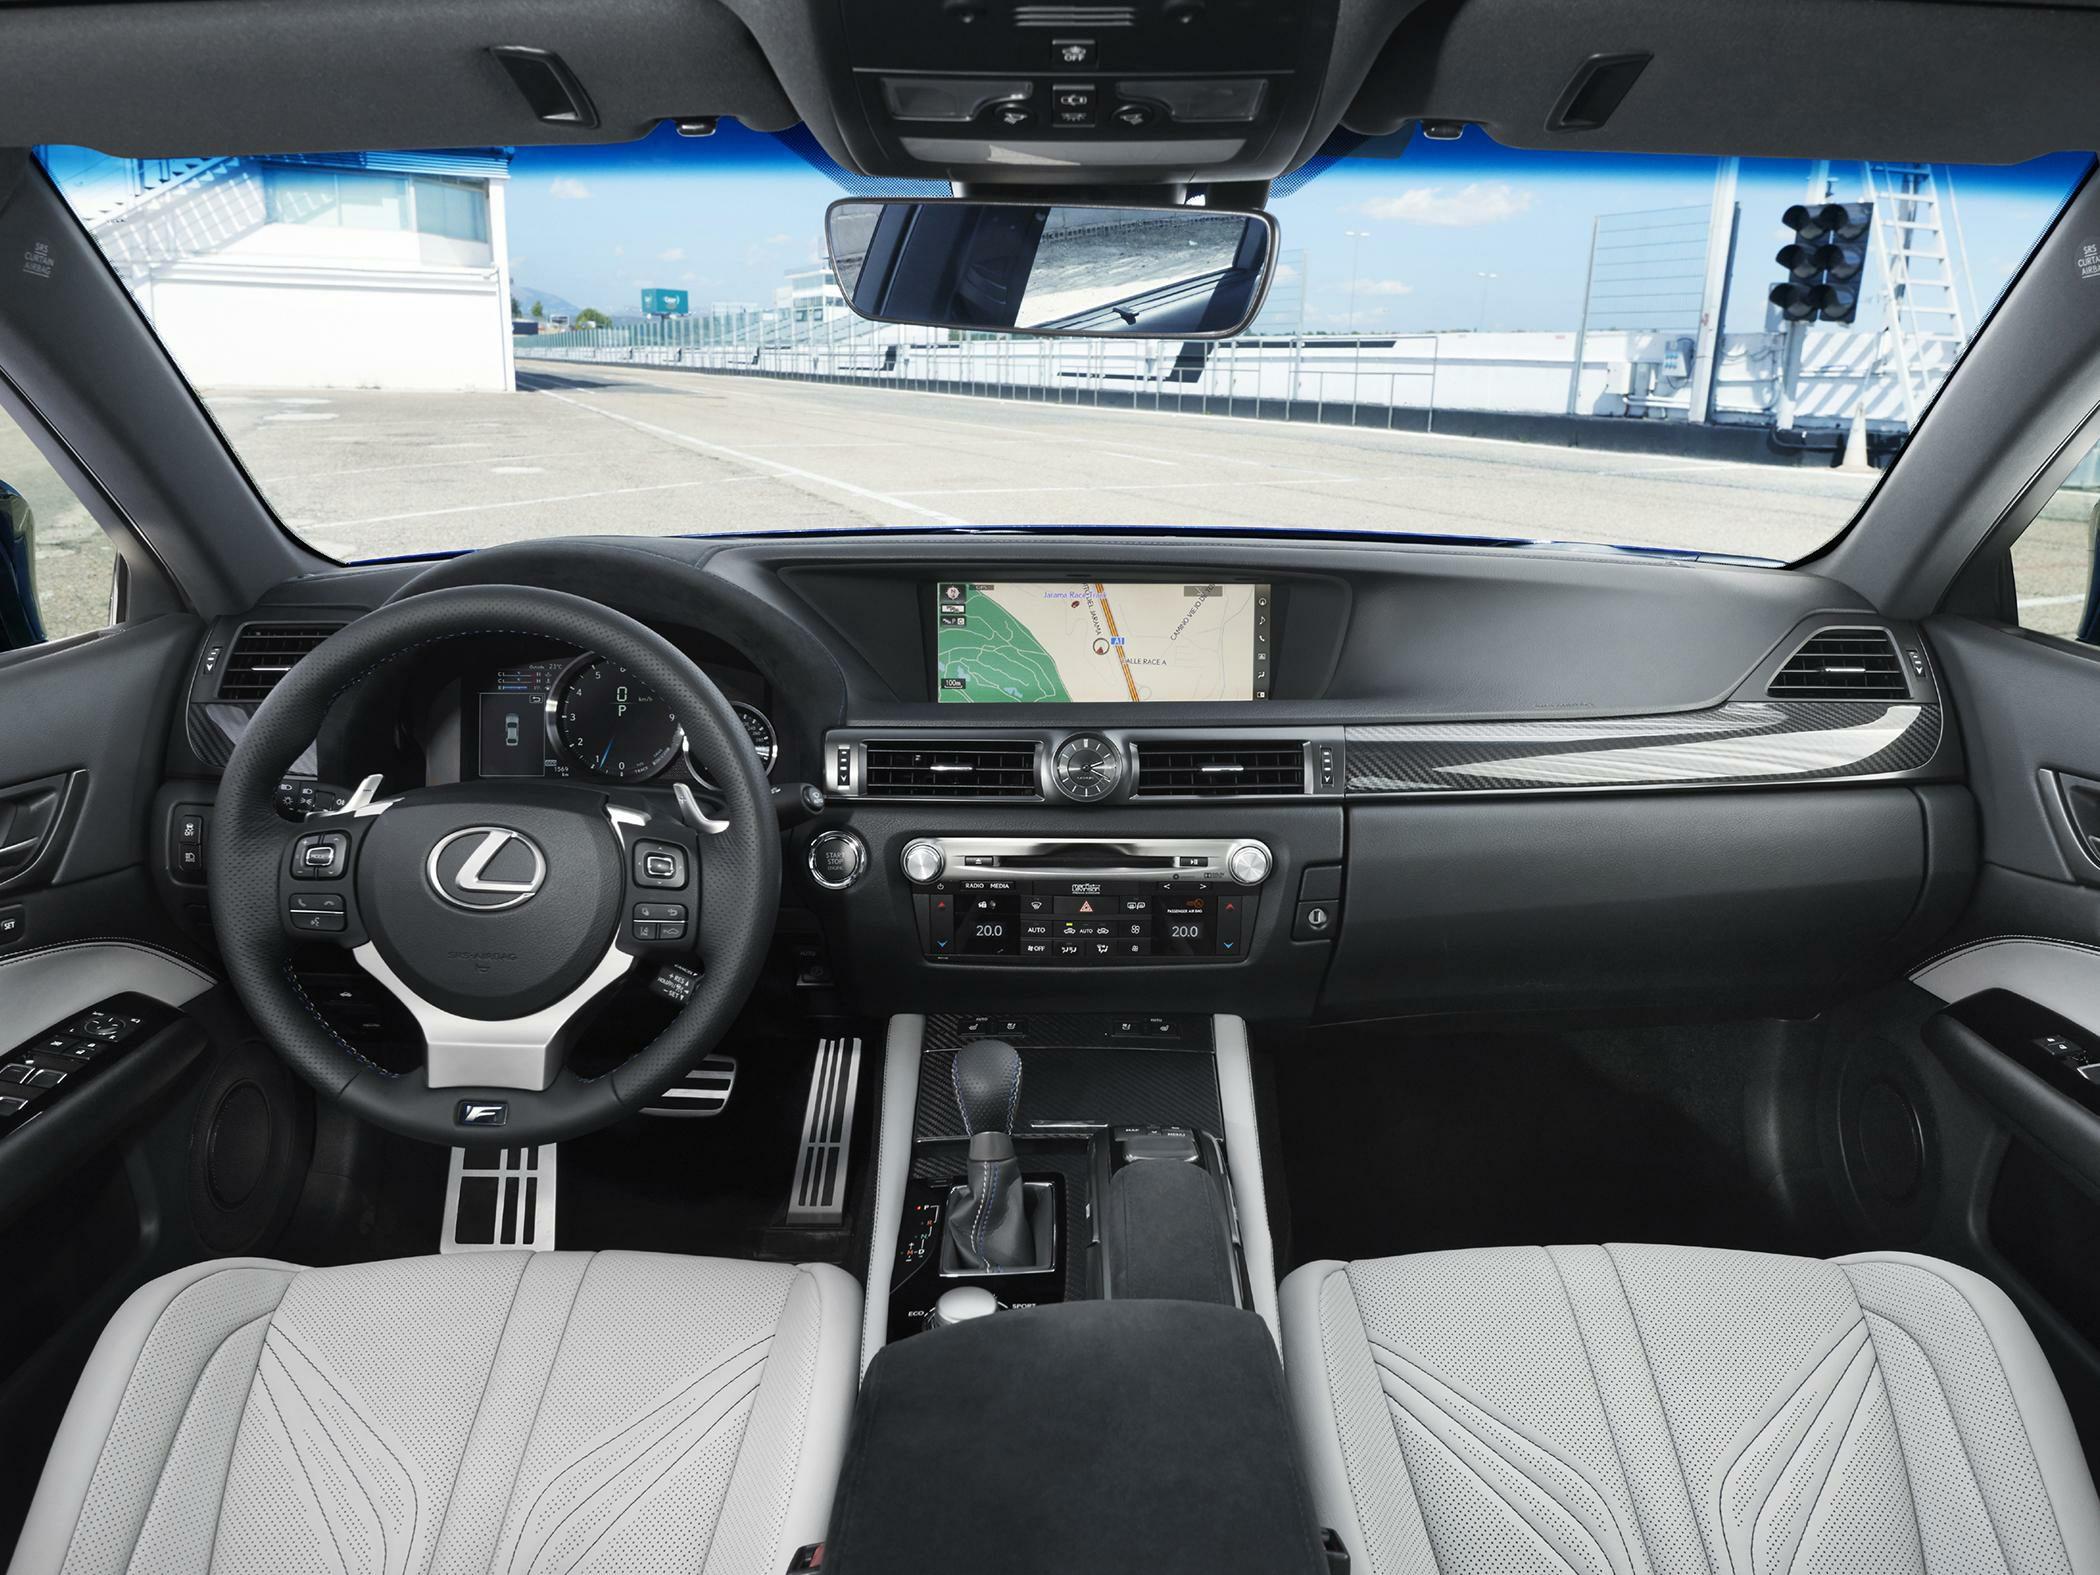 2018 Lexus GS 350 Deals Prices Incentives & Leases Overview